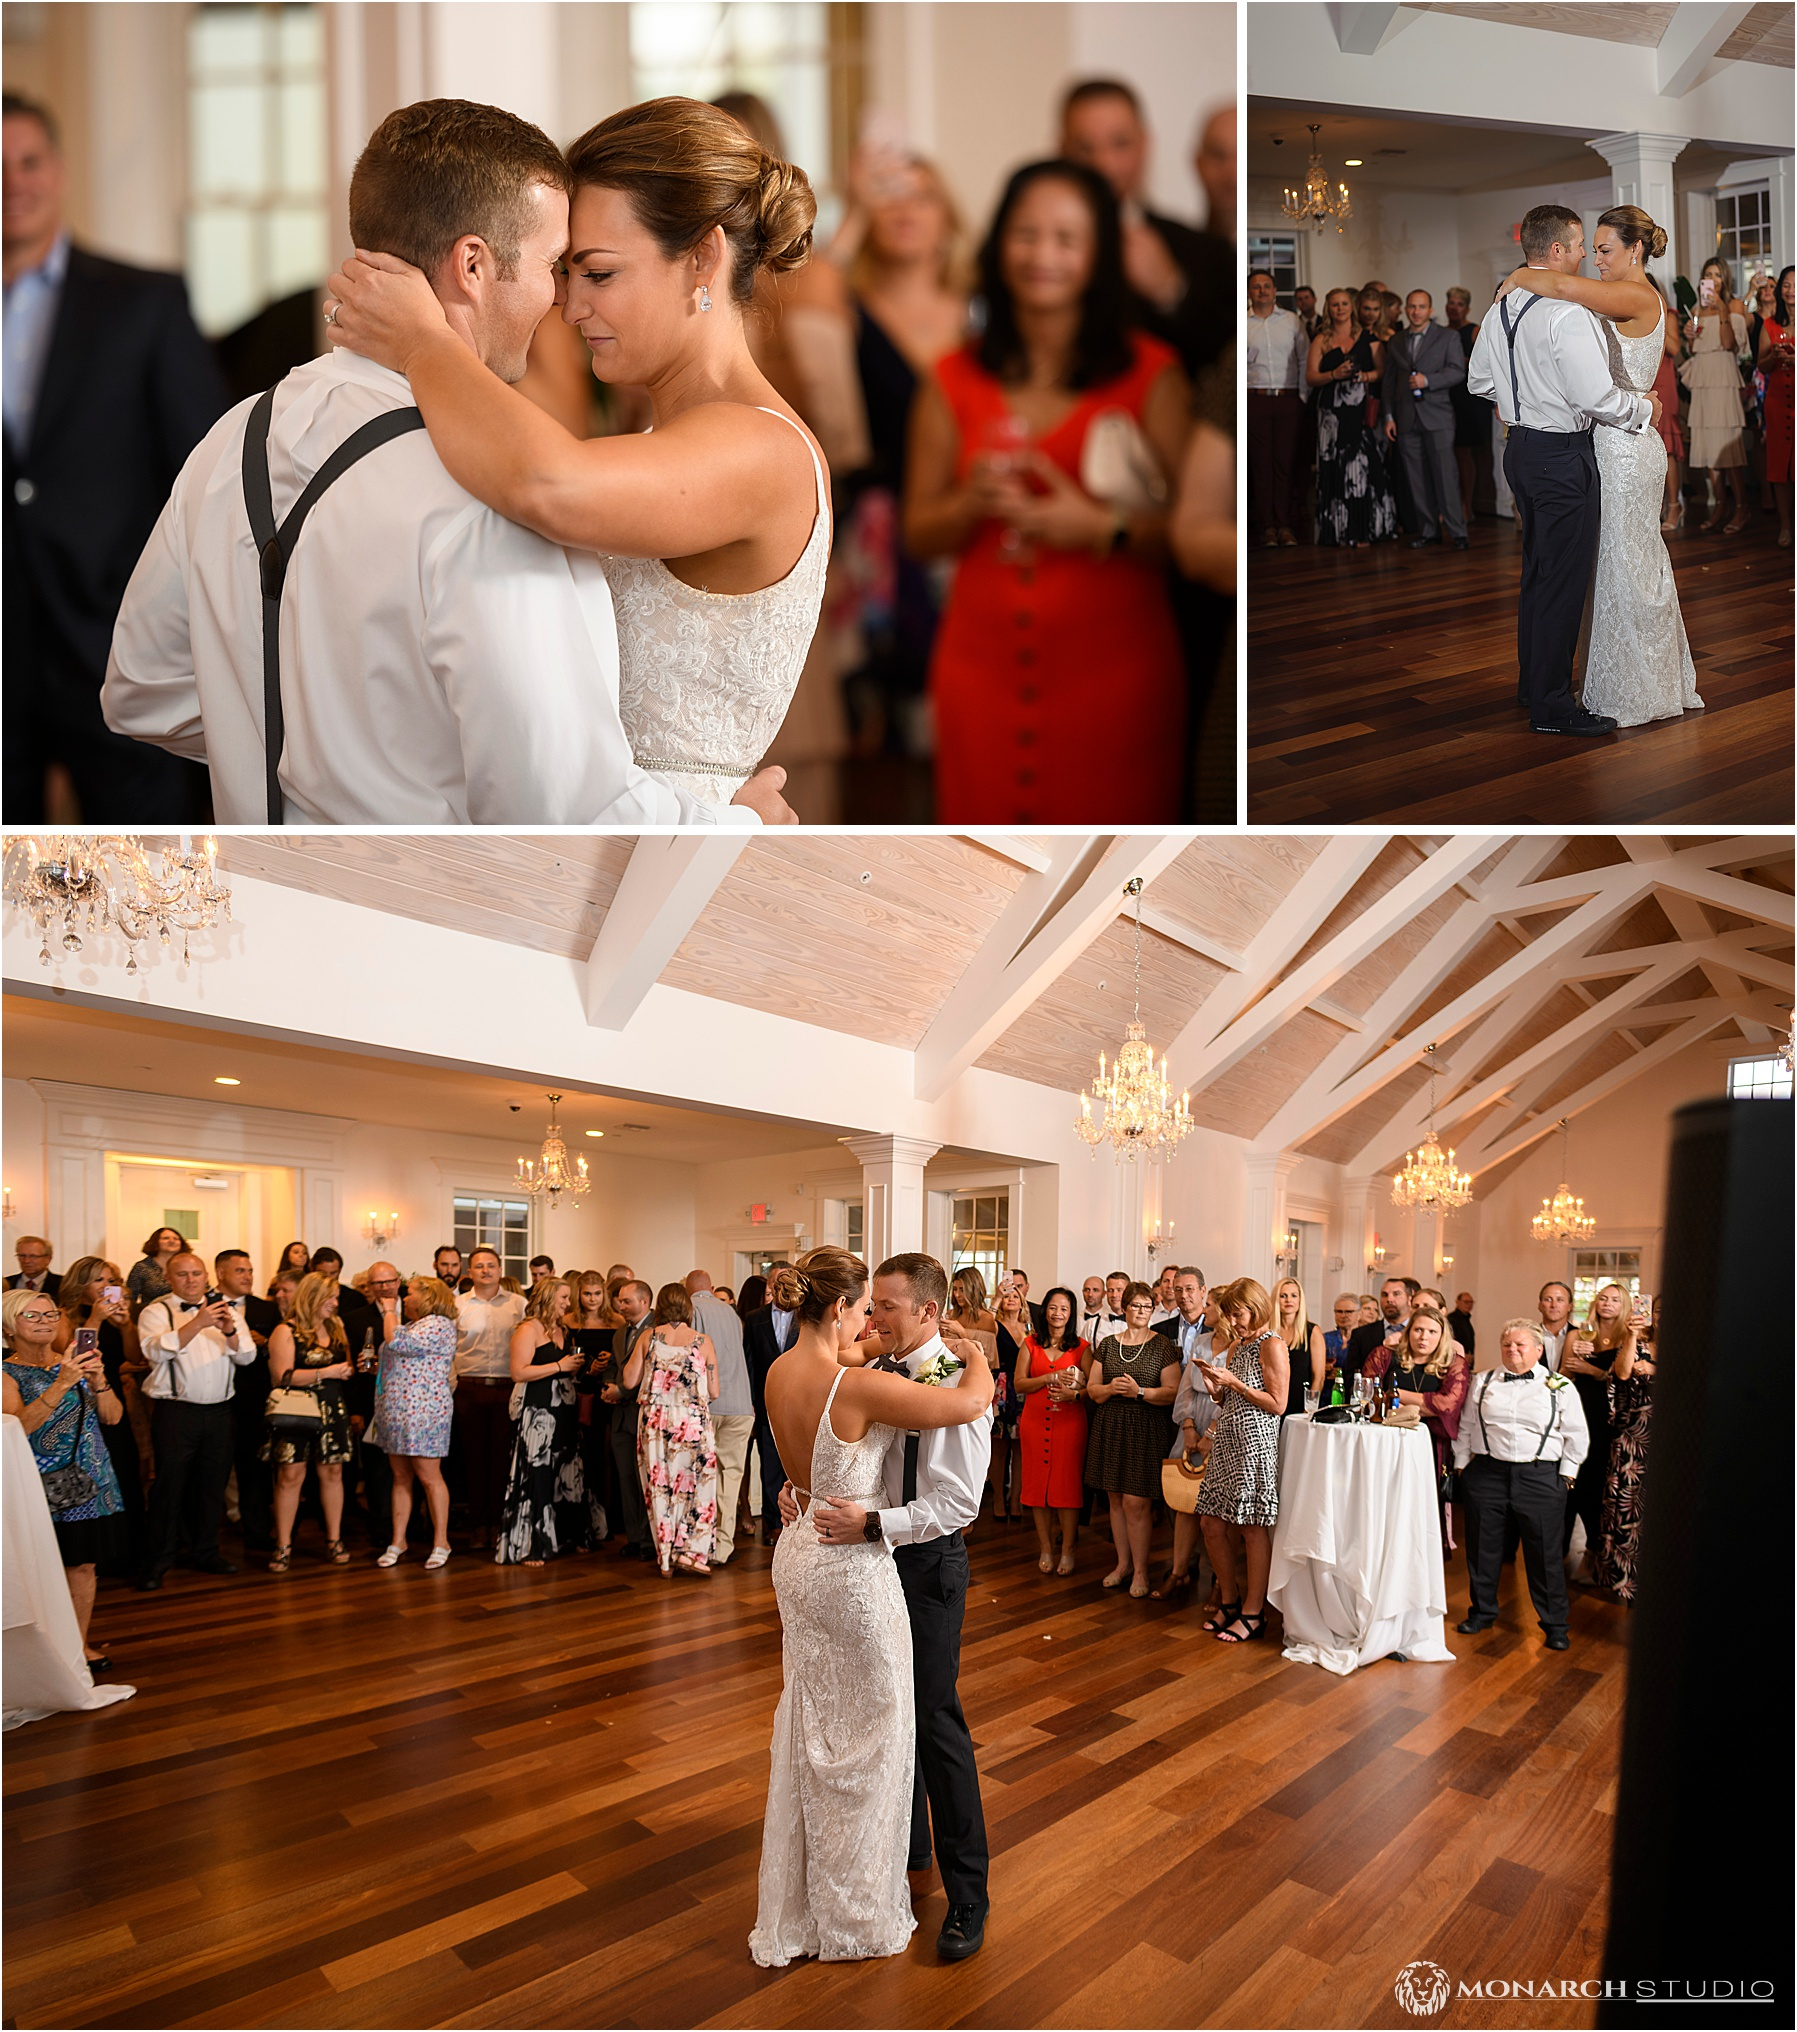 092-whiteroom-wedding-photographer-2019-05-22_0074.jpg